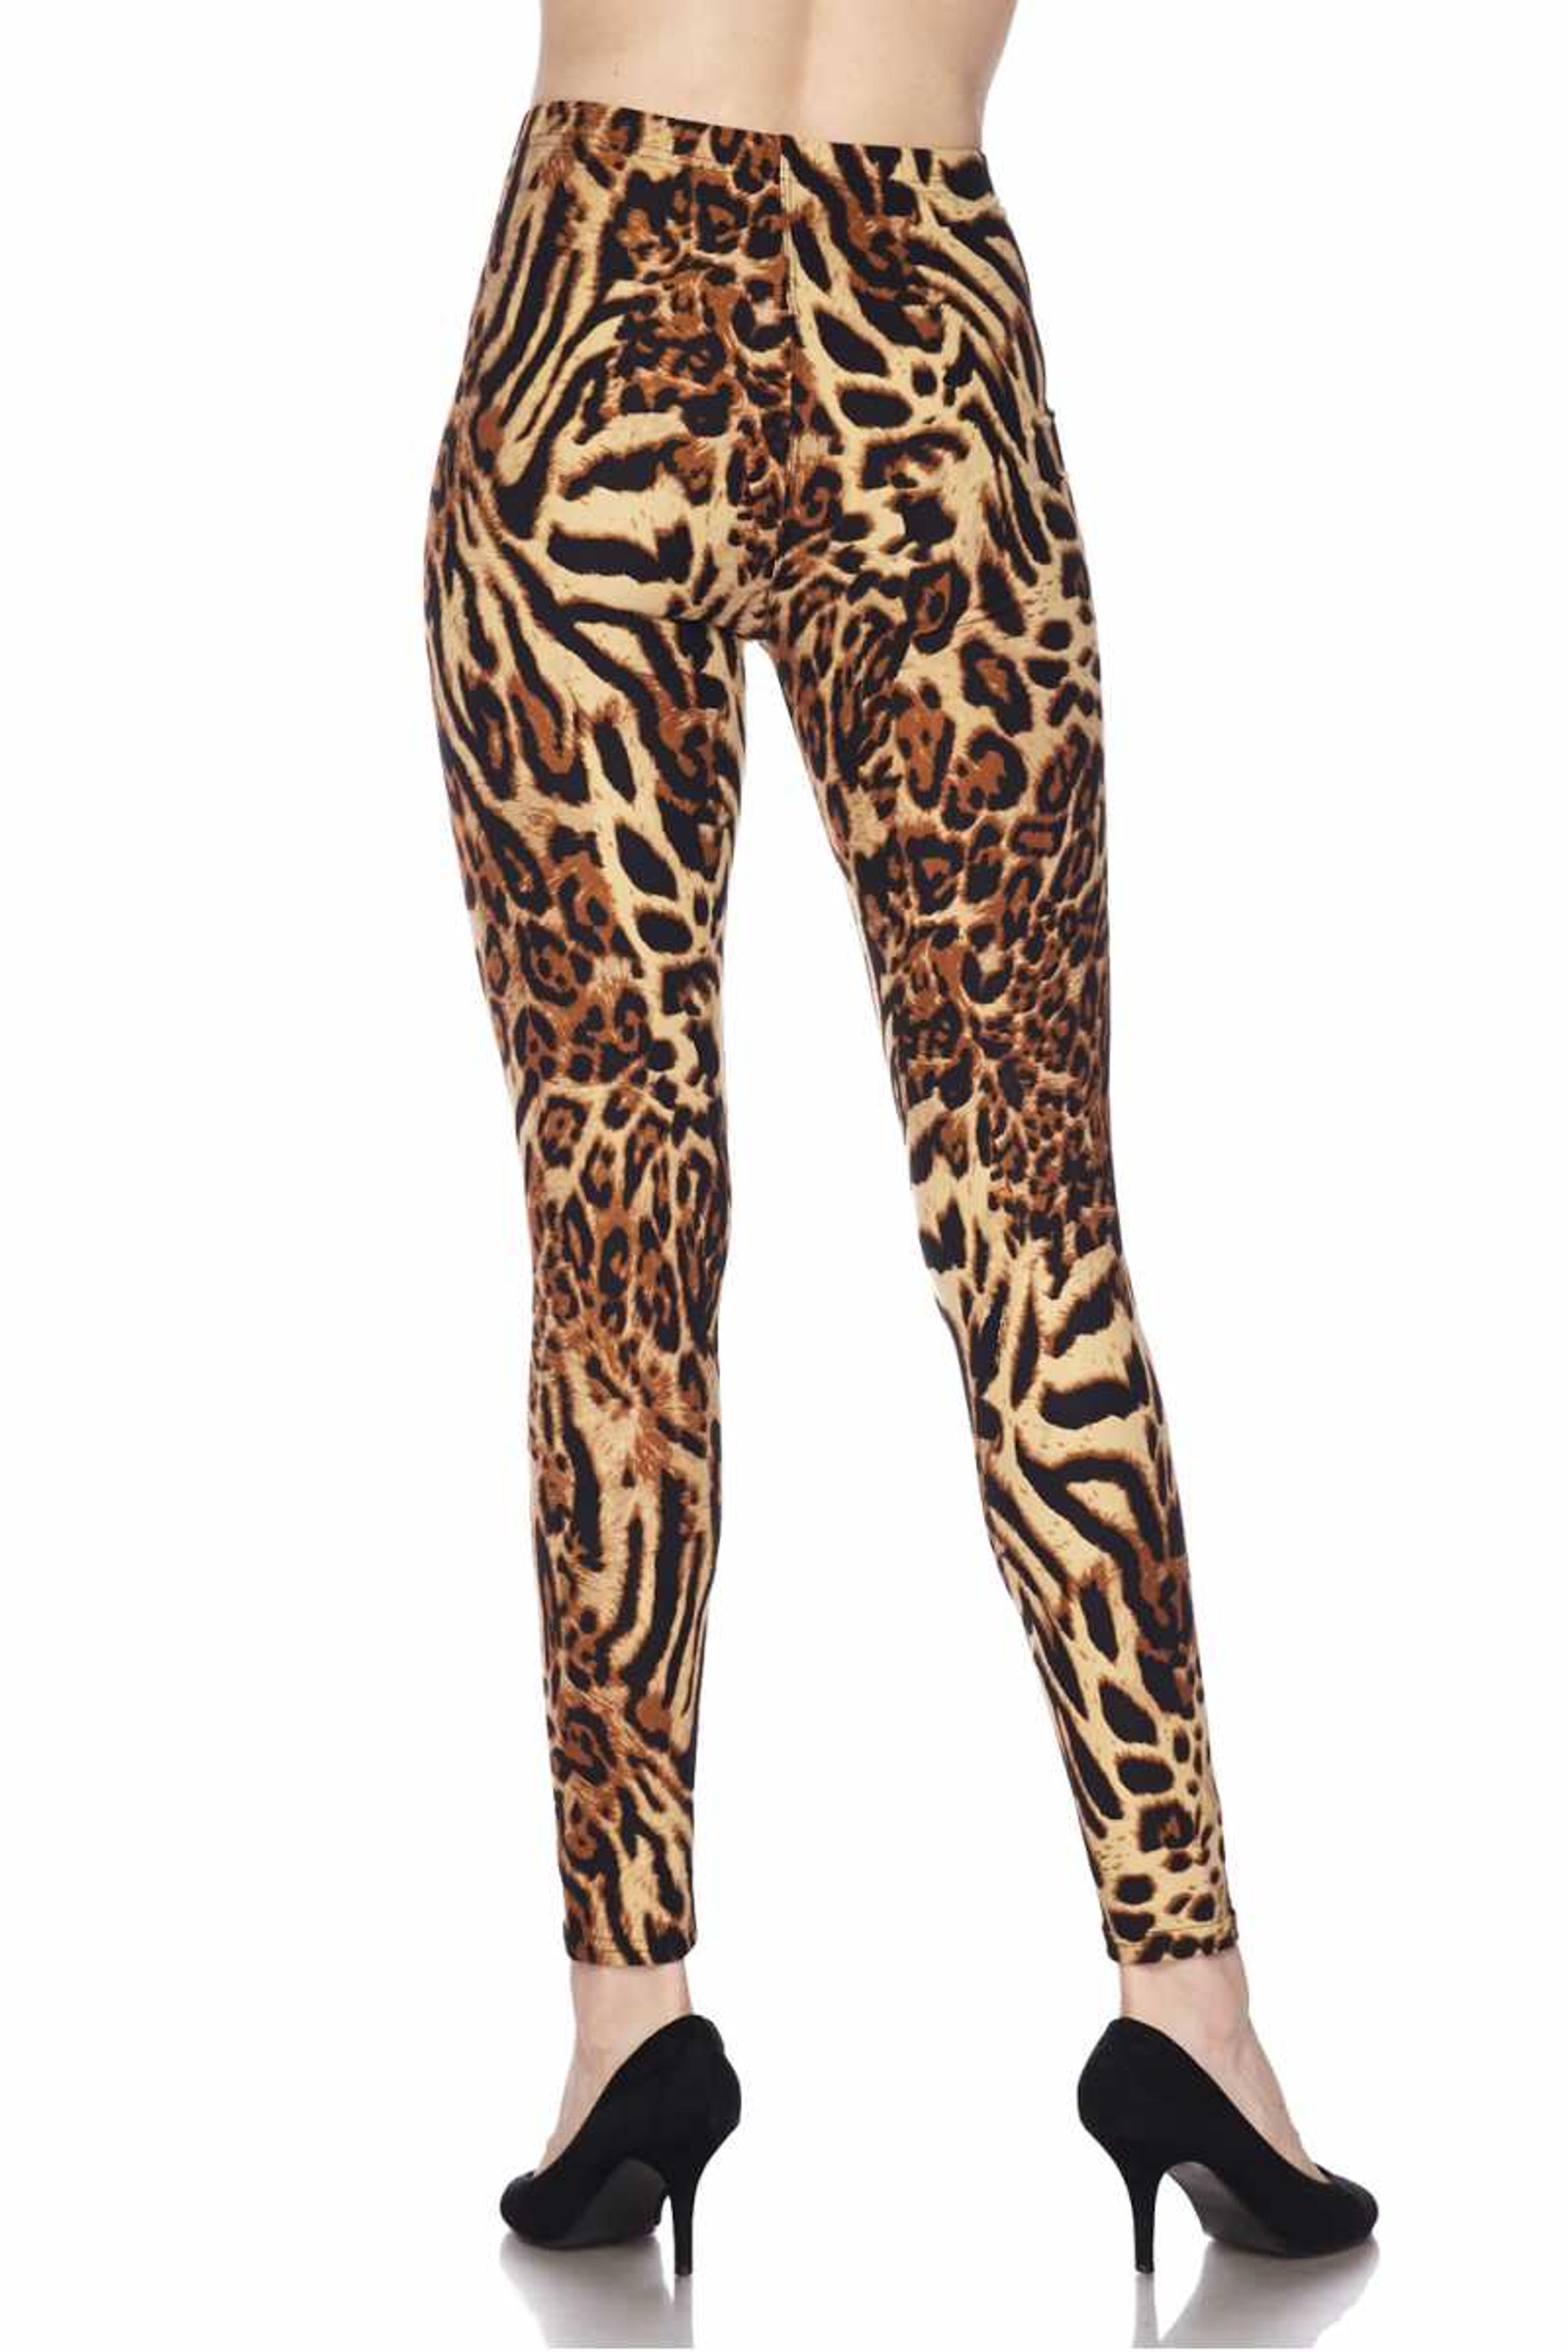 Soft Brushed Predator Leopard Plus Size Leggings